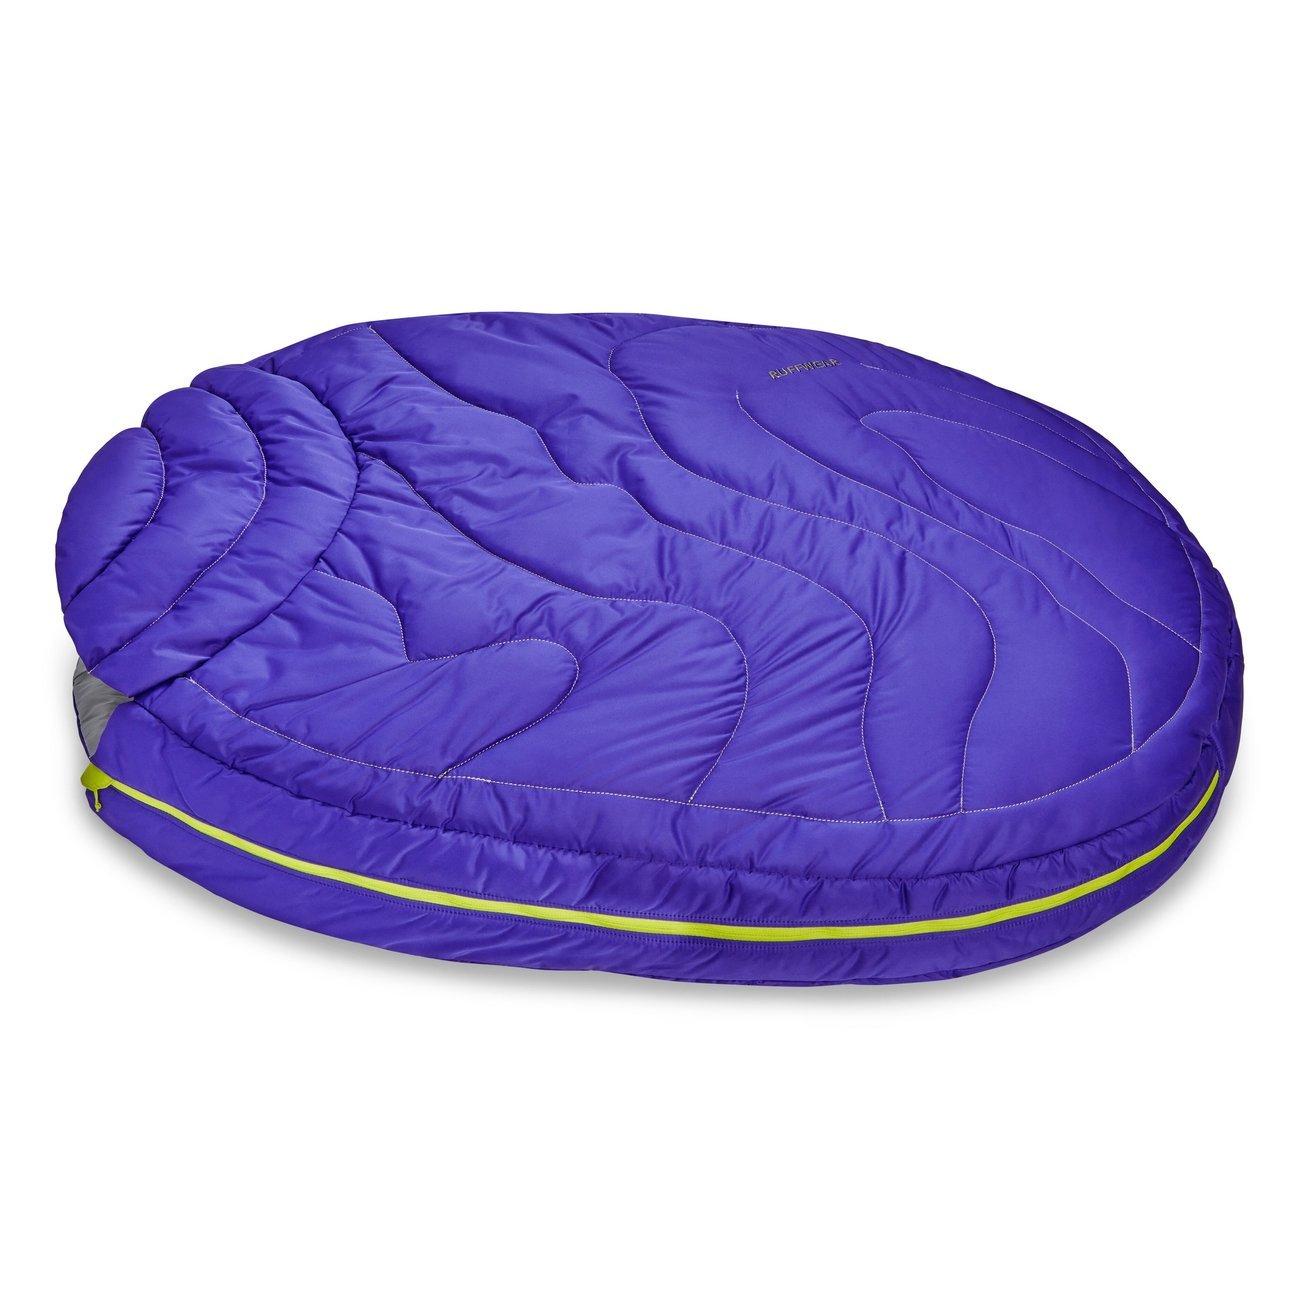 Ruffwear Highlands Sleeping Bag™ Schlafsack für Hunde, Bild 20